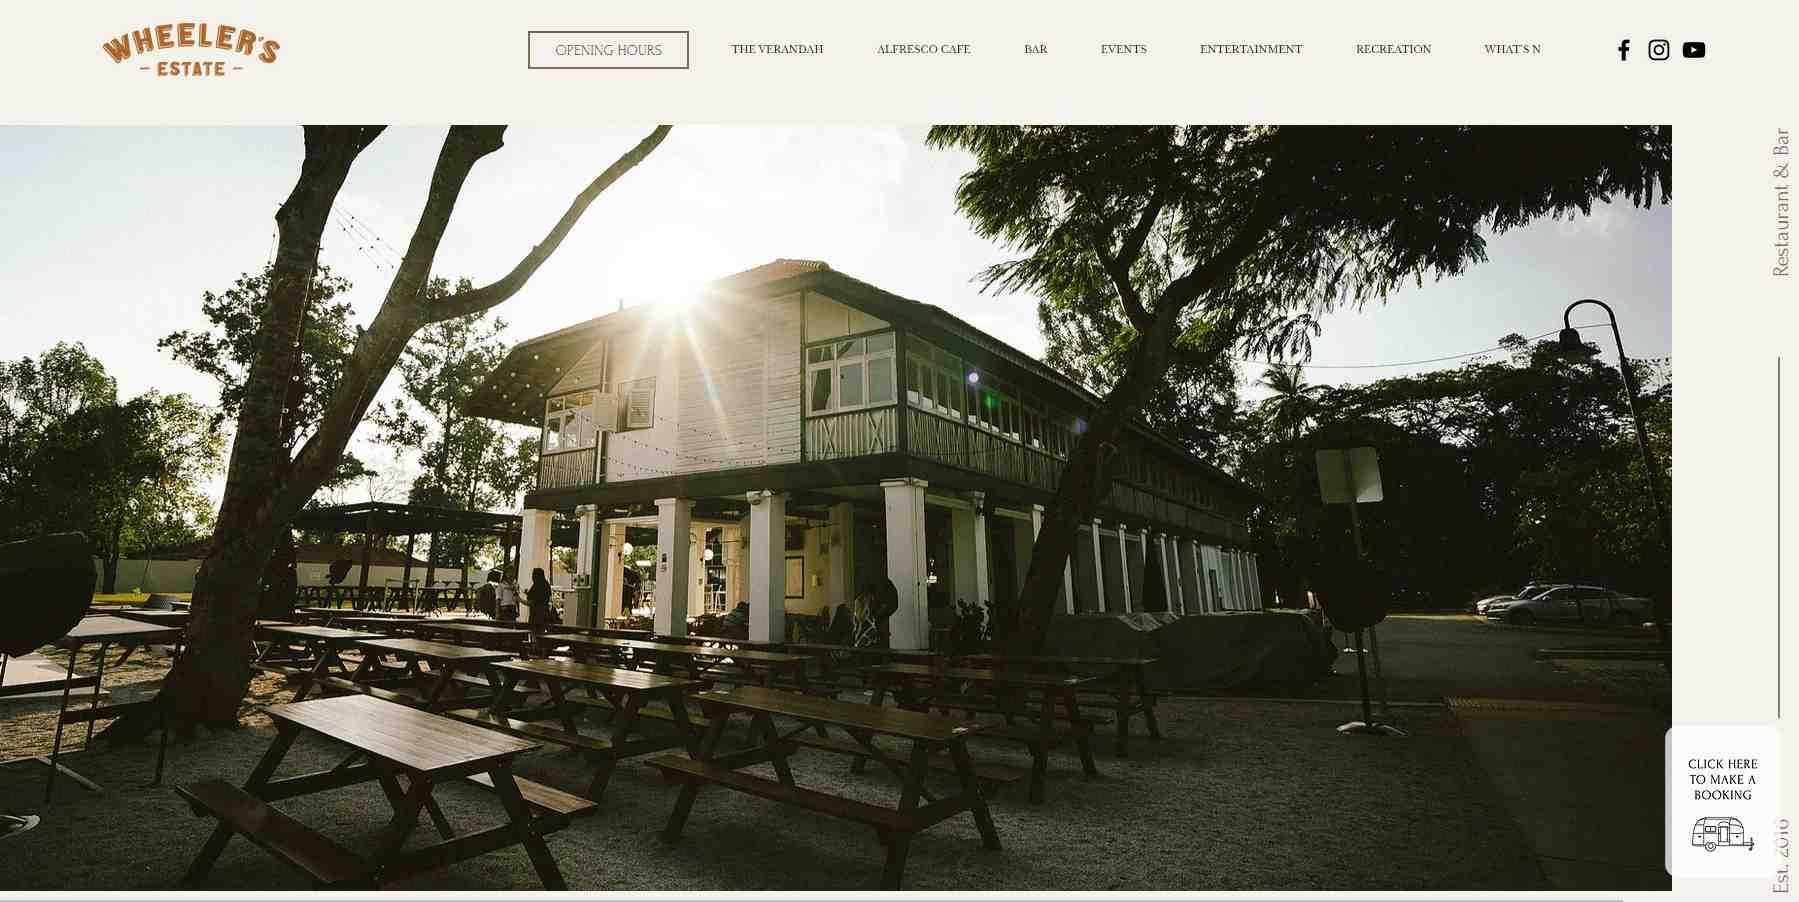 wheeler's estate Top Bars in Singapore